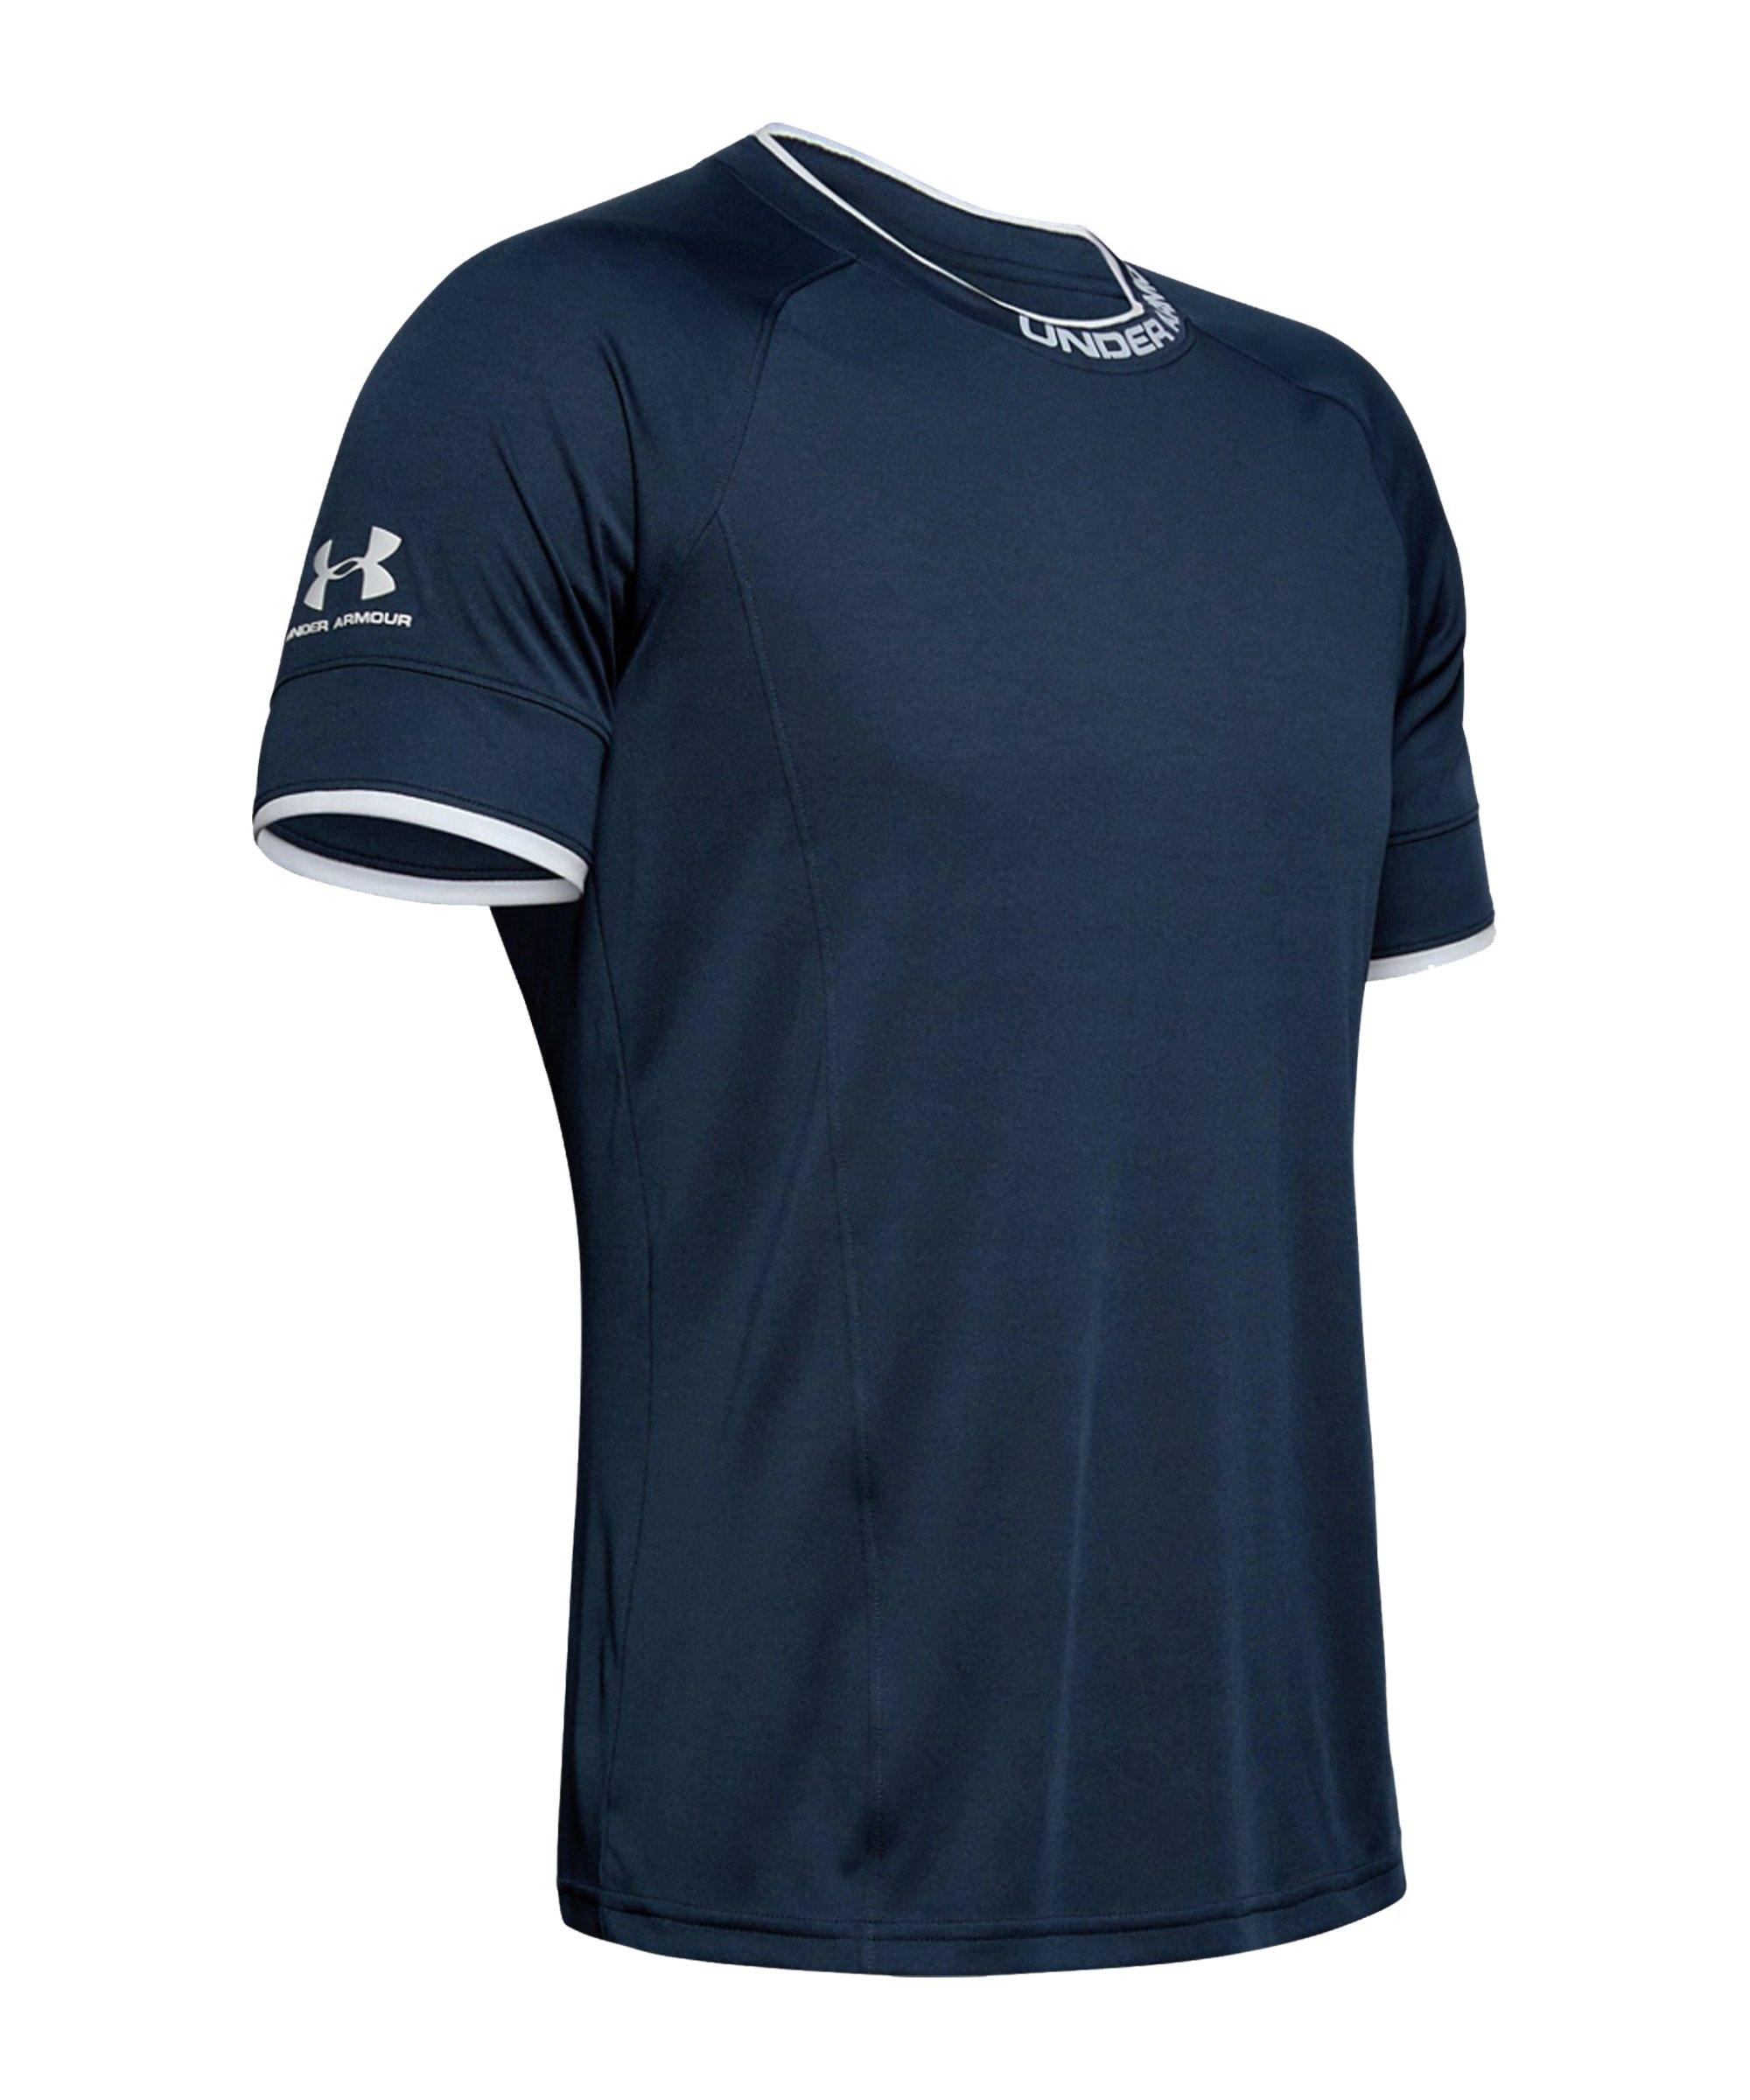 Under Armour Challenger III T-Shirt Blau F408 - blau